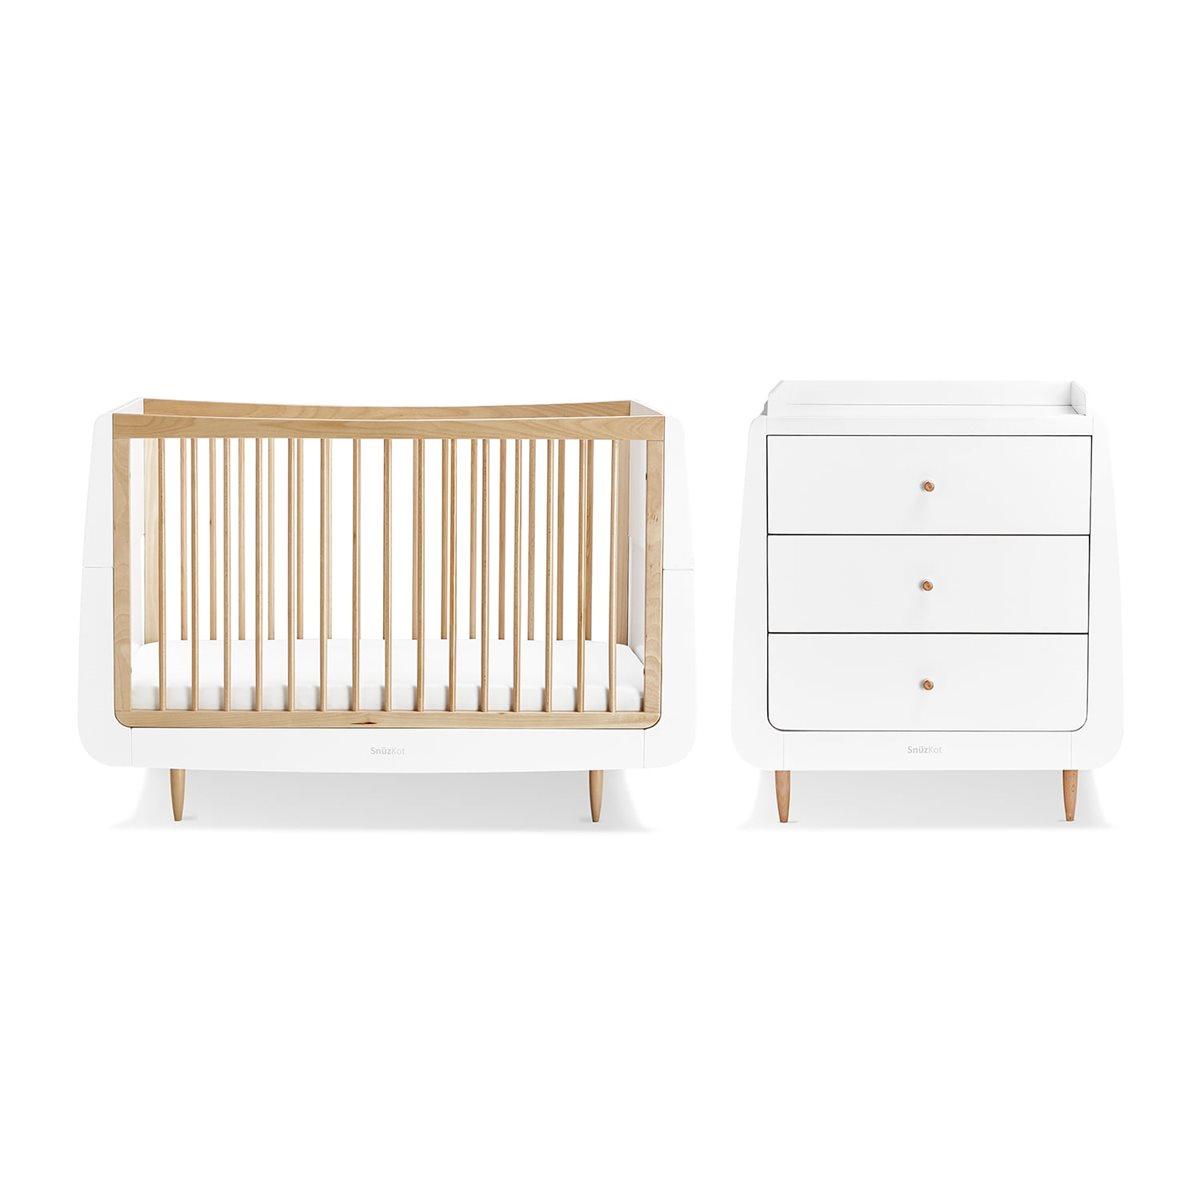 Skandi Natural Furniture Set Furniture Set From Snuz Snuz